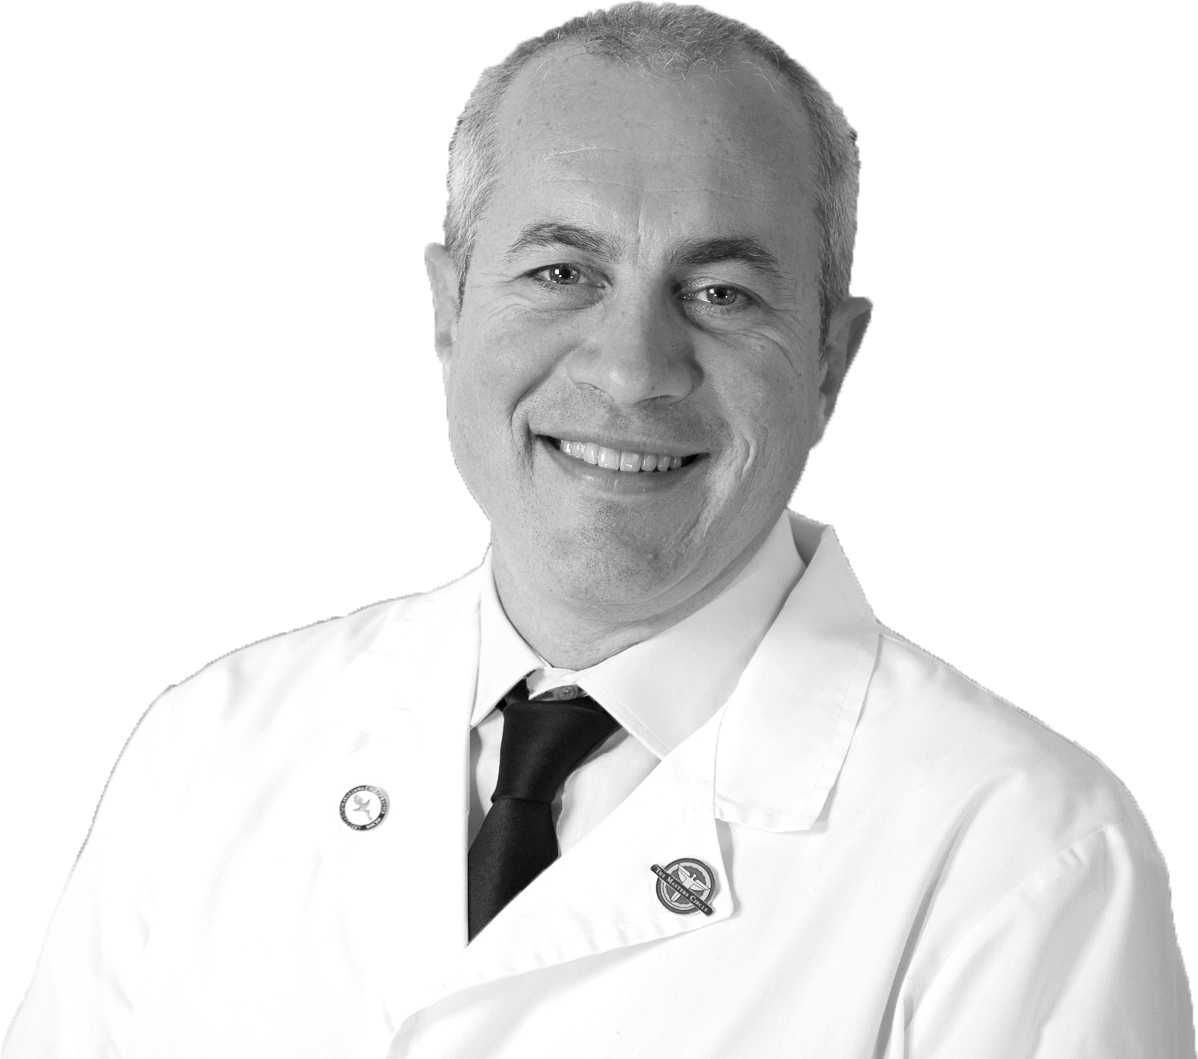 Manuel M. Mazzini